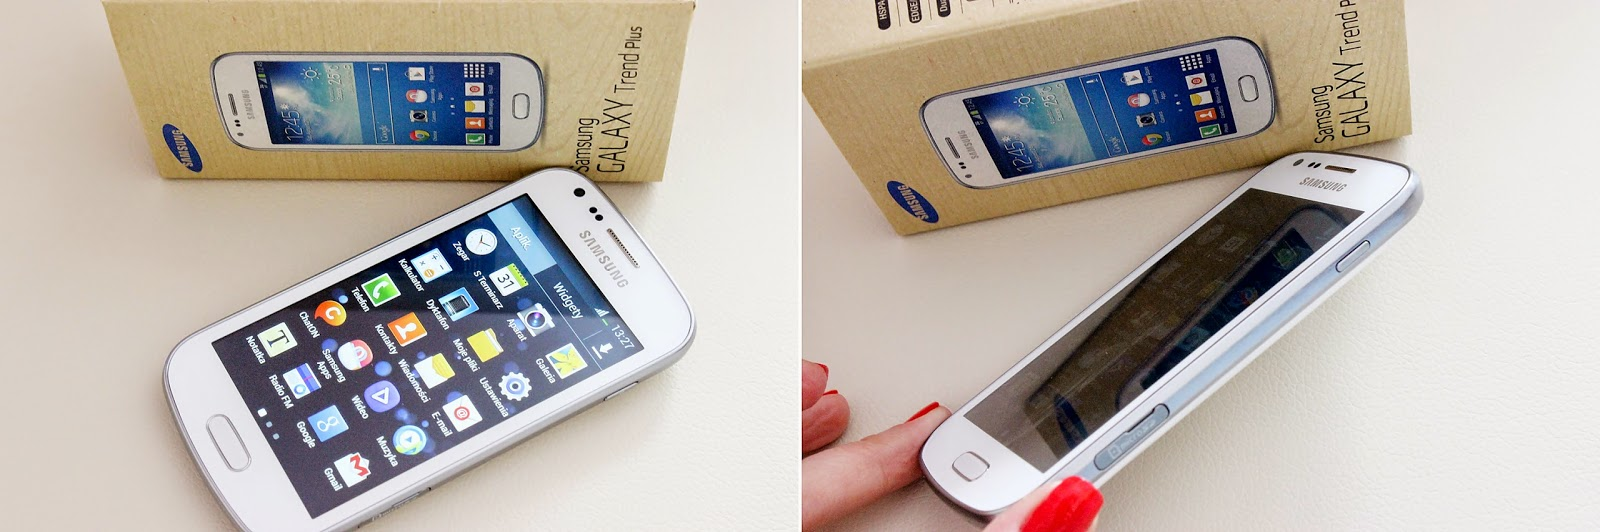 Samsung Trend plus, lista marzeń, telefon Samsung